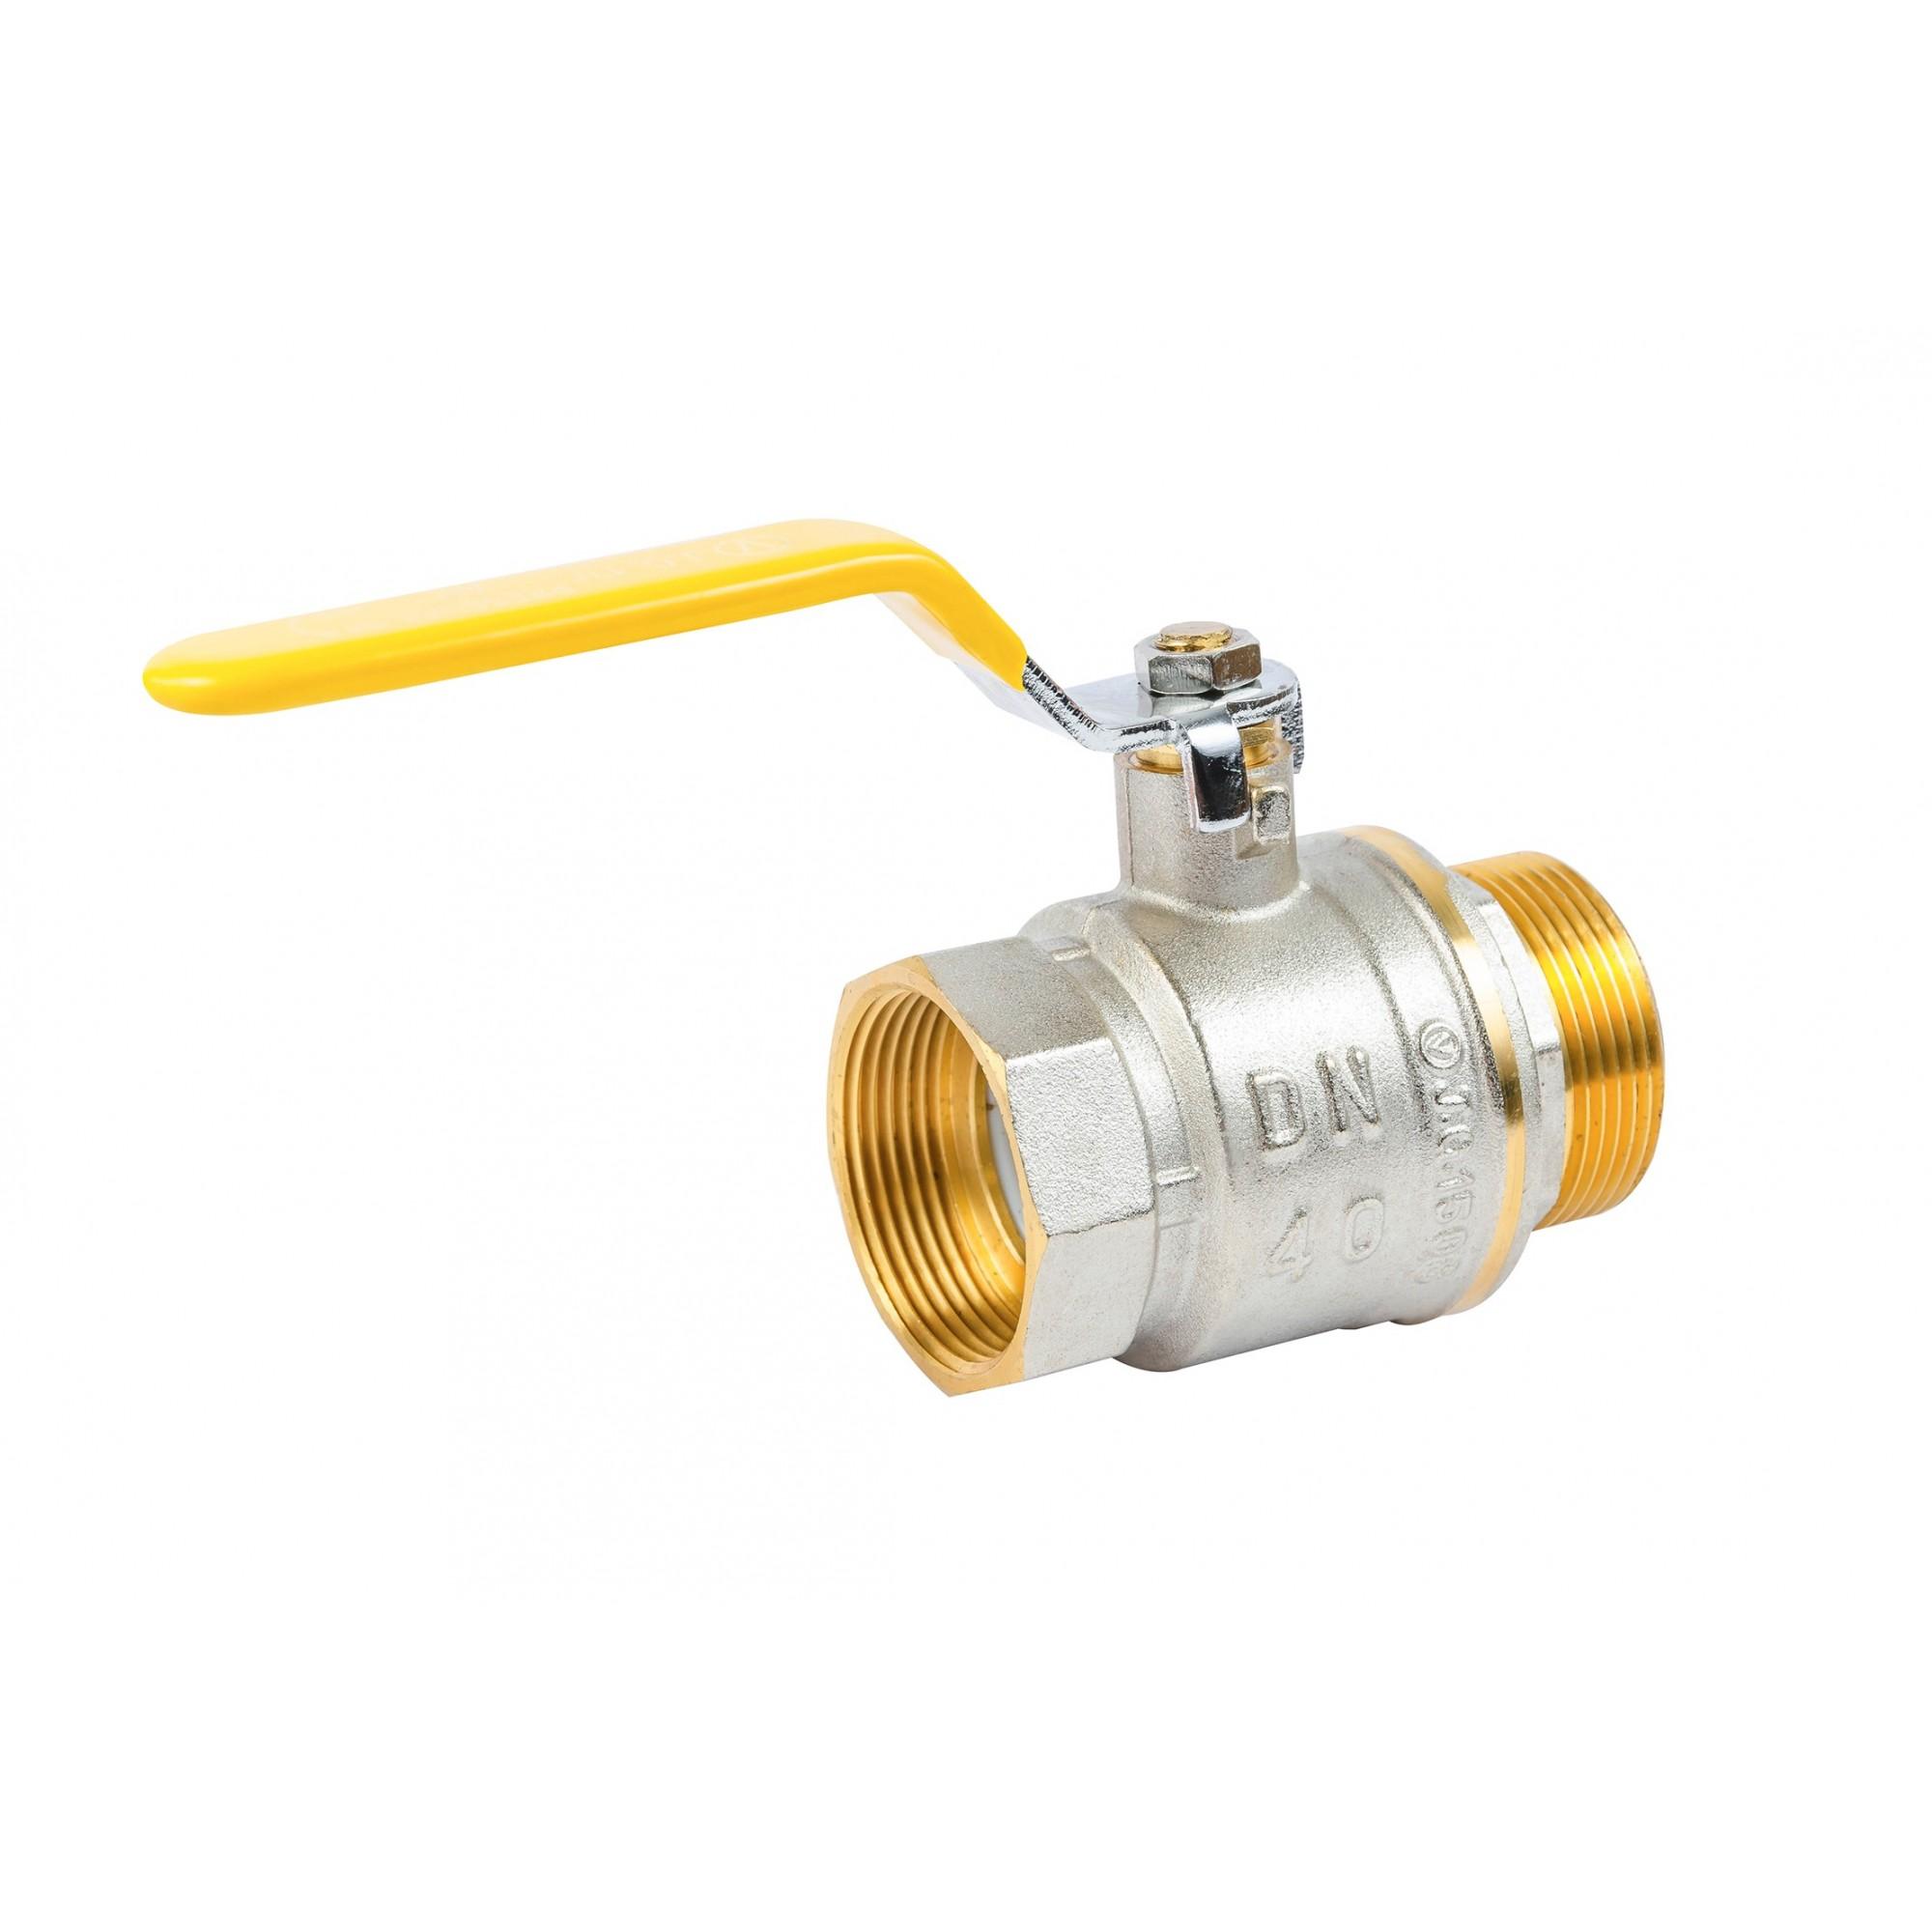 Кран шаровый Valve JG  1-1/2'' нв желтая ручка для газа J.G. - 1